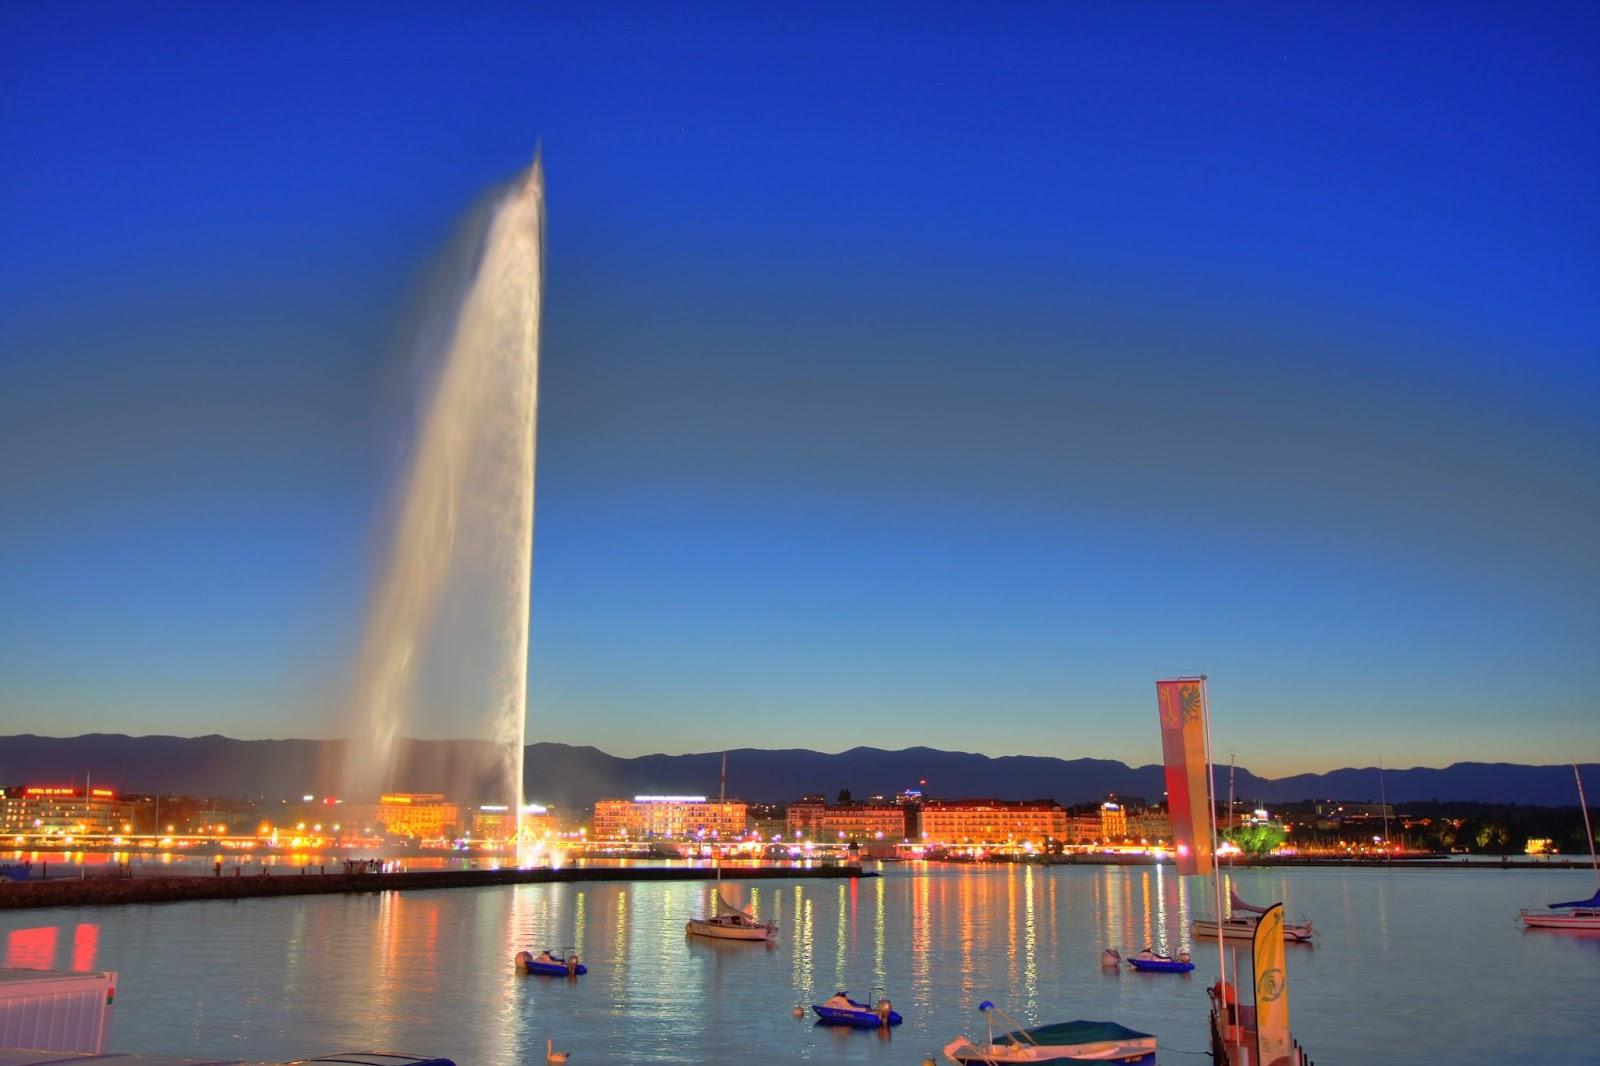 Plan Your Honeymoon in Switzerland | fountain on the lake